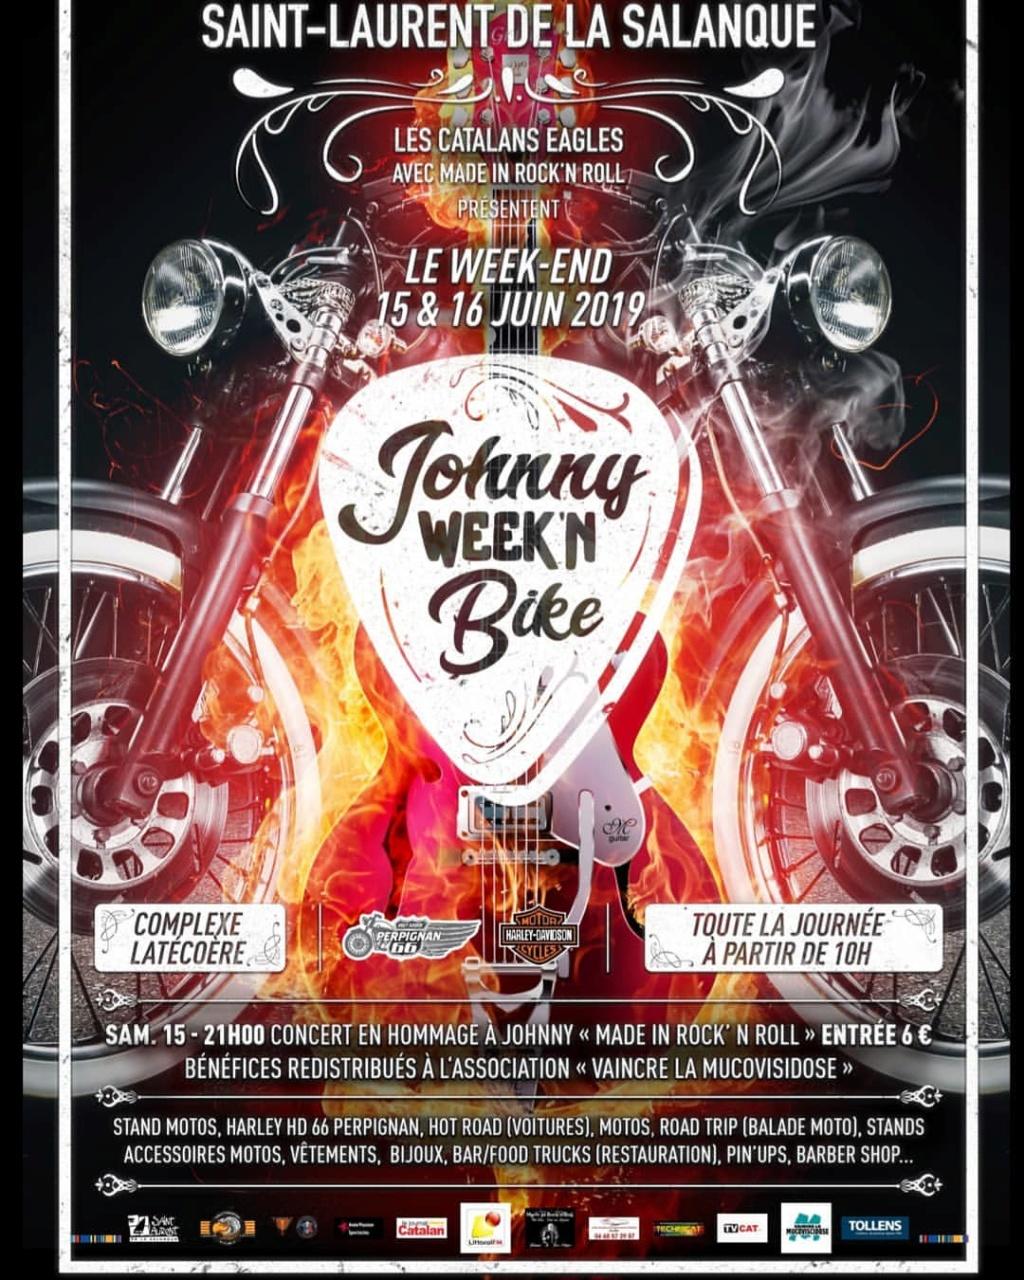 MANIFESTATION - Johnny Week'N Bike - 15 & 16 Juin 2019 - Saint - Laurent De La Salanque  53790510